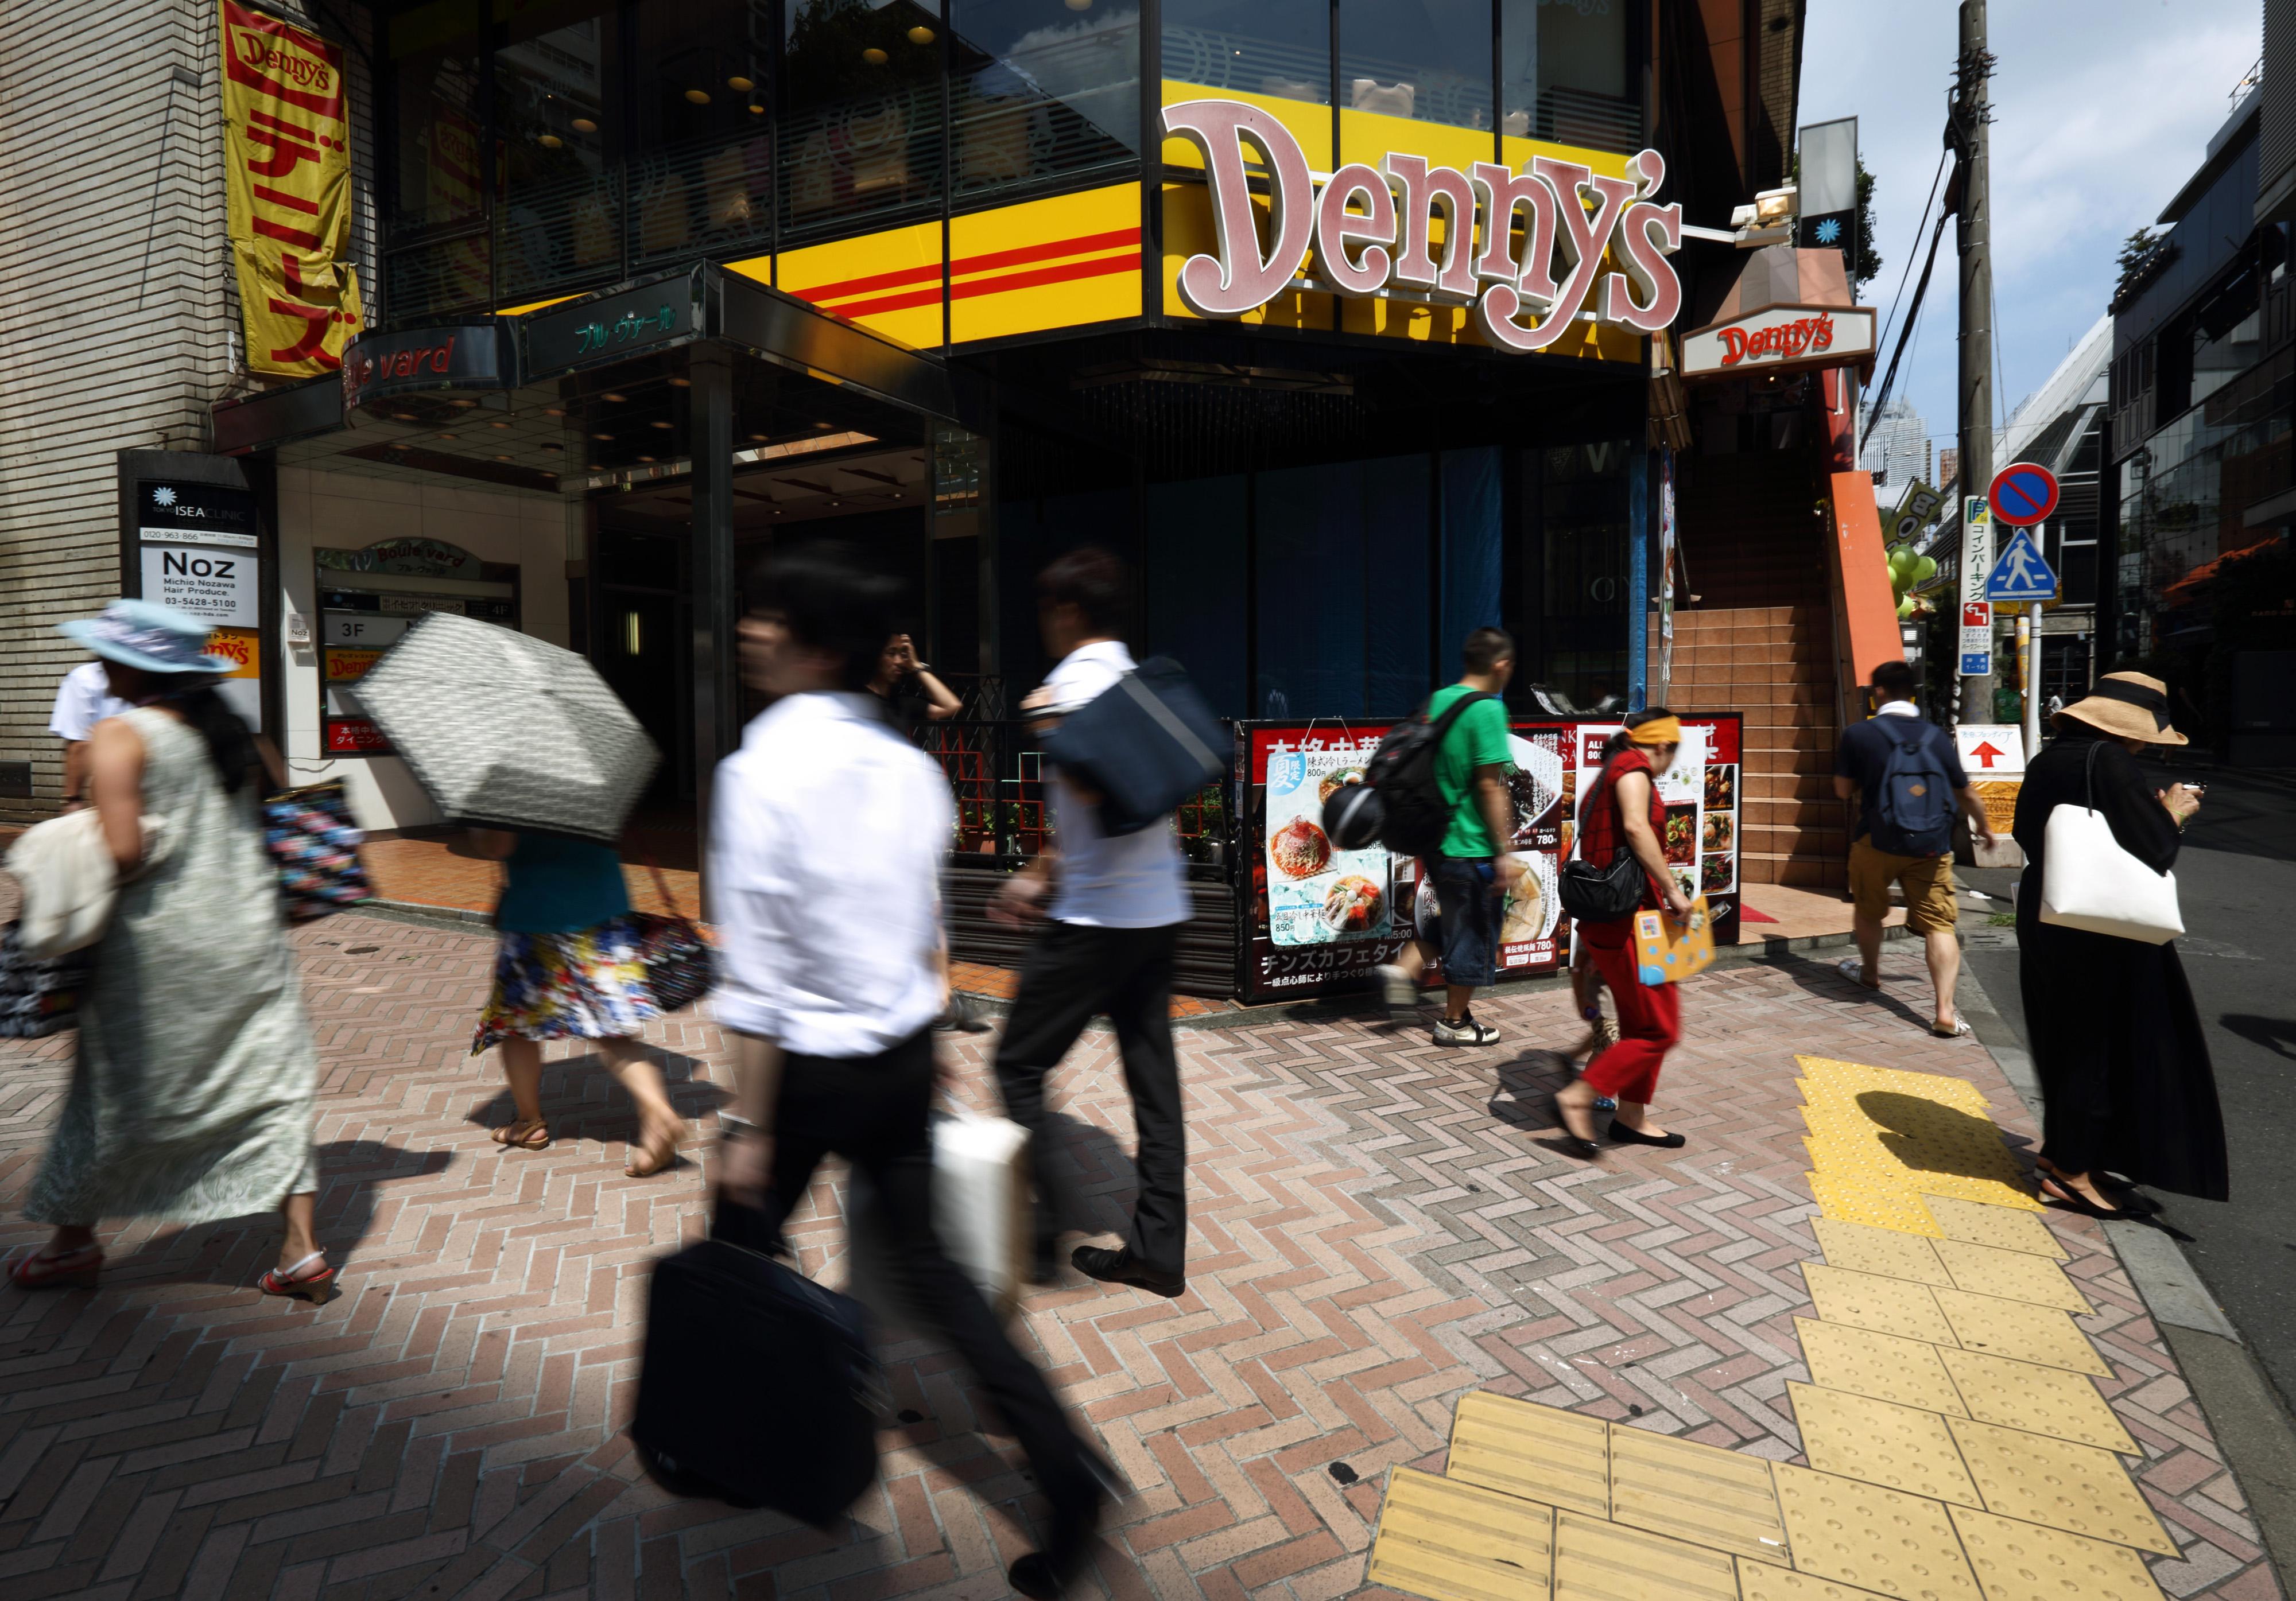 Views Of Seven & I Holdings Co.'s Seibu Department Store, Barneys Japan, Loft Store And Denny's Restaurant